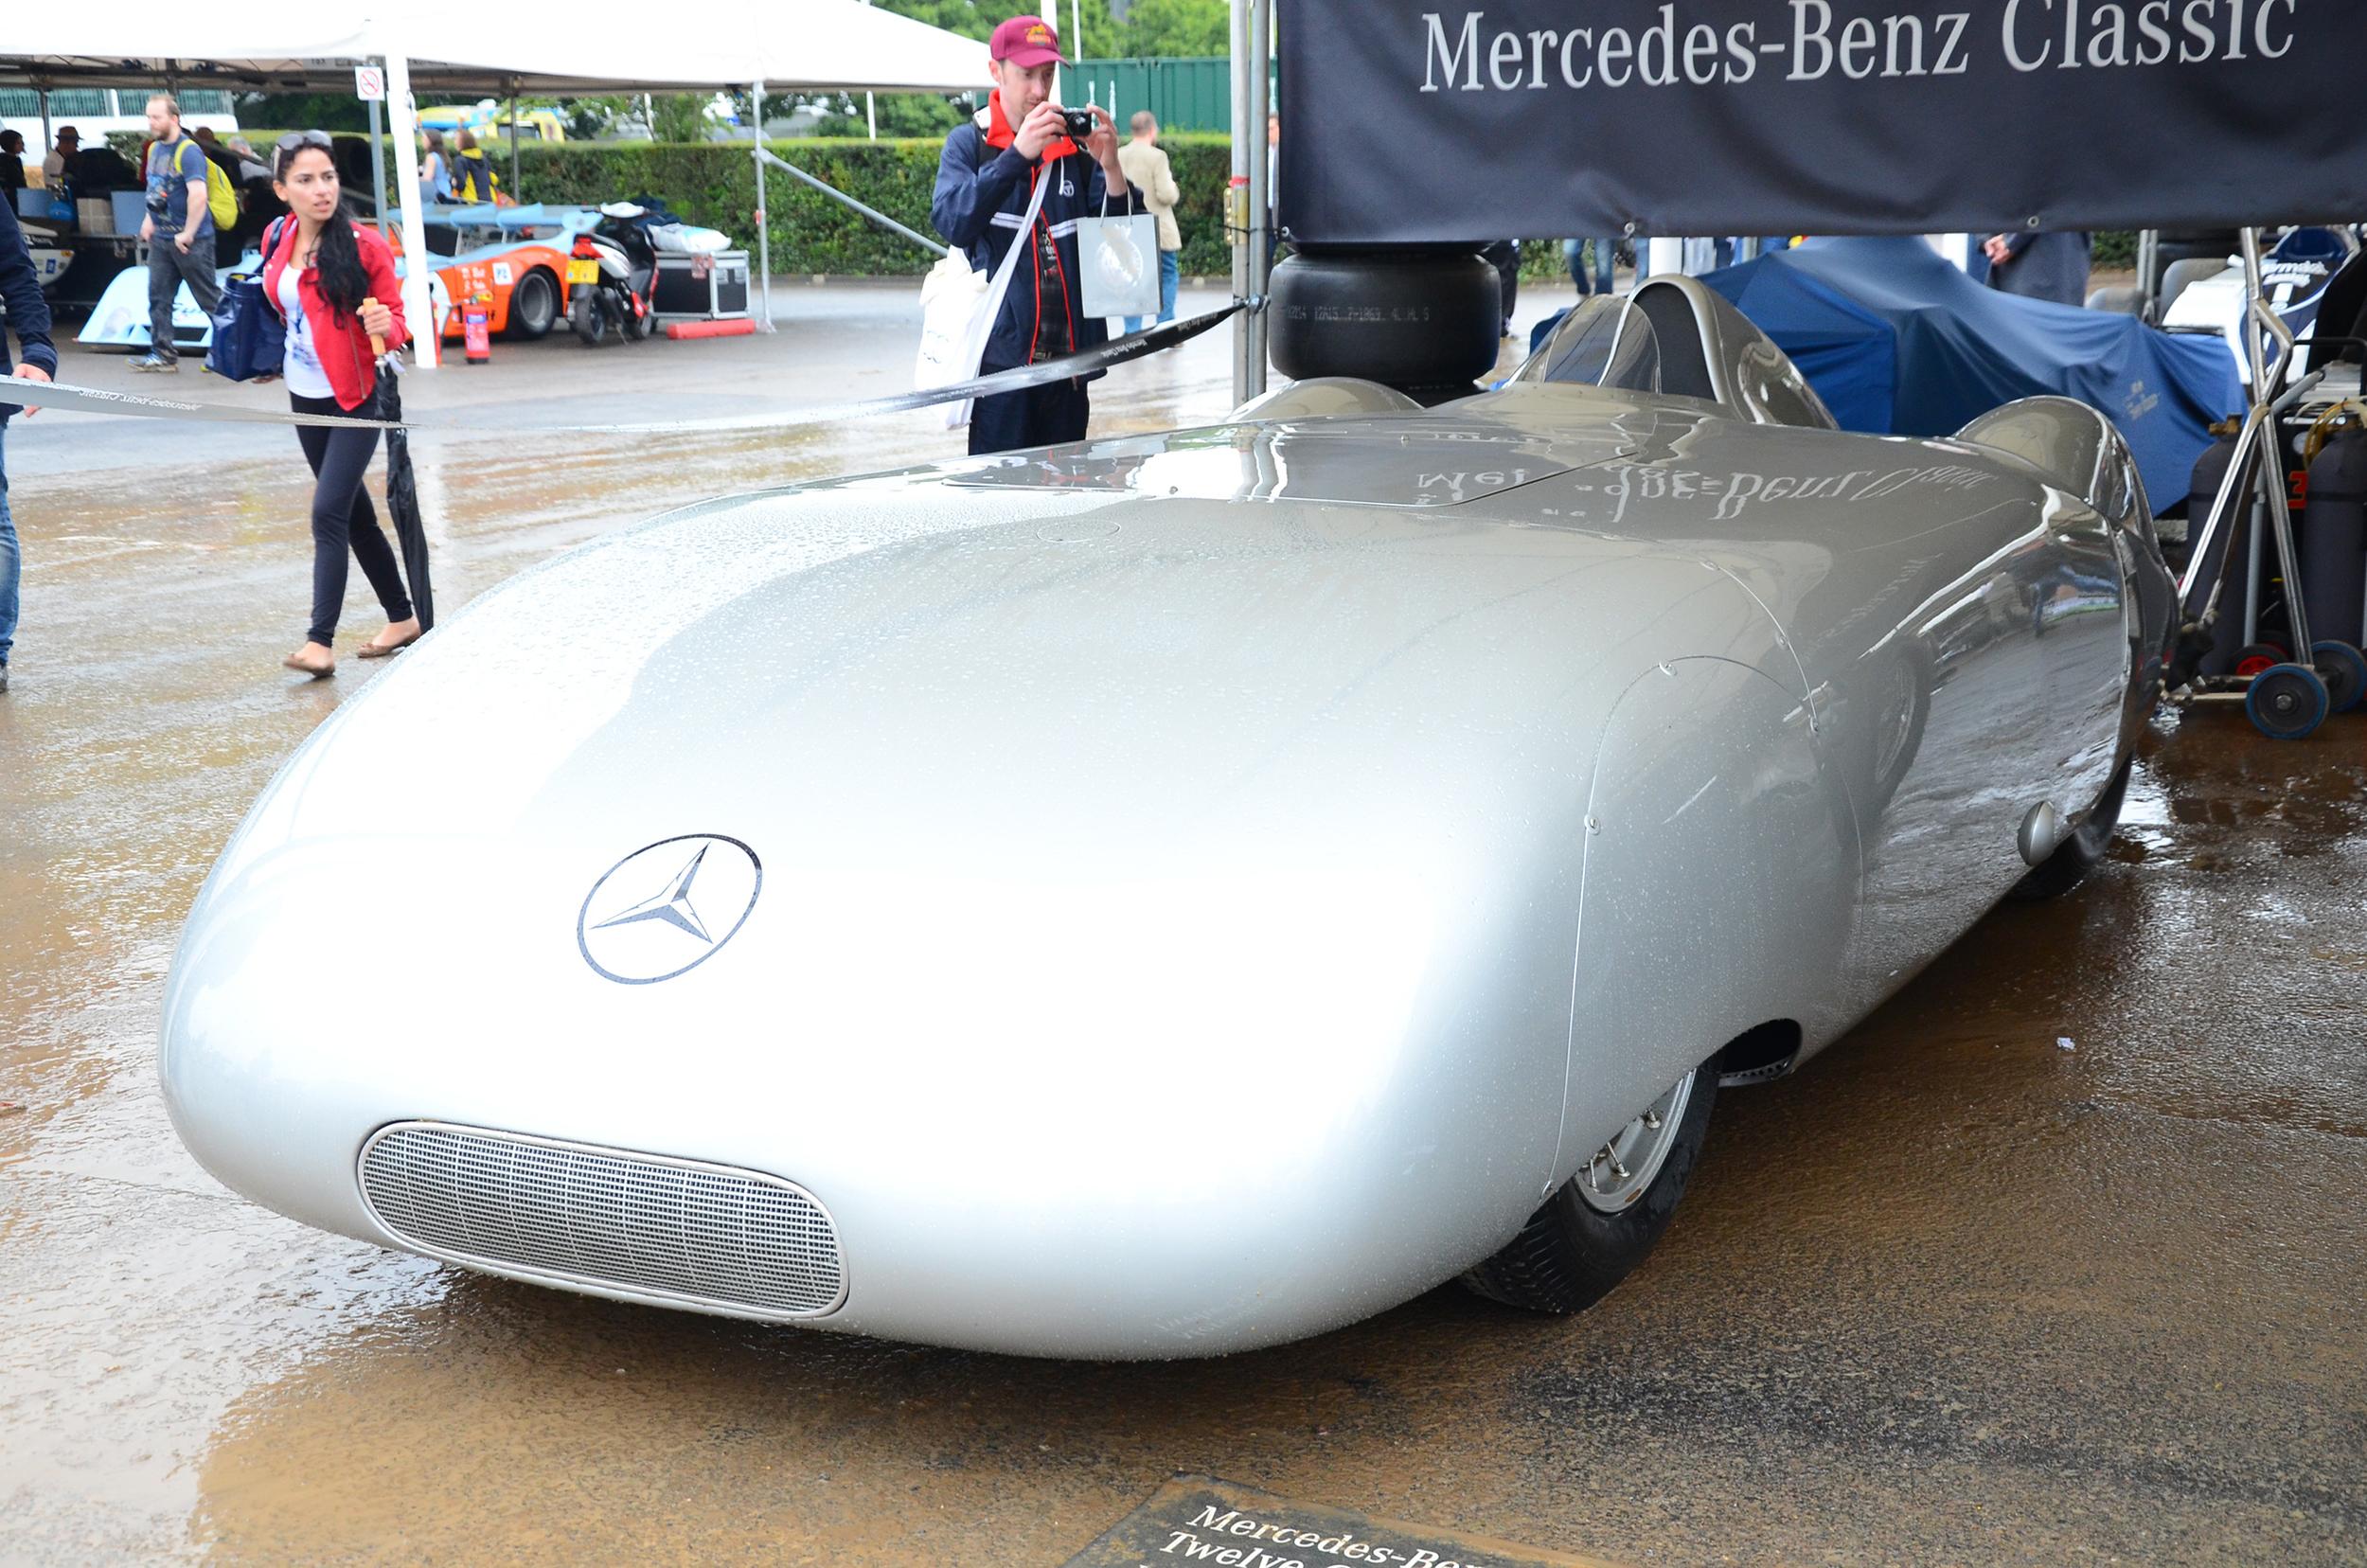 1936 Mercedes-Benz W25 AVUS Streamliner.JPG